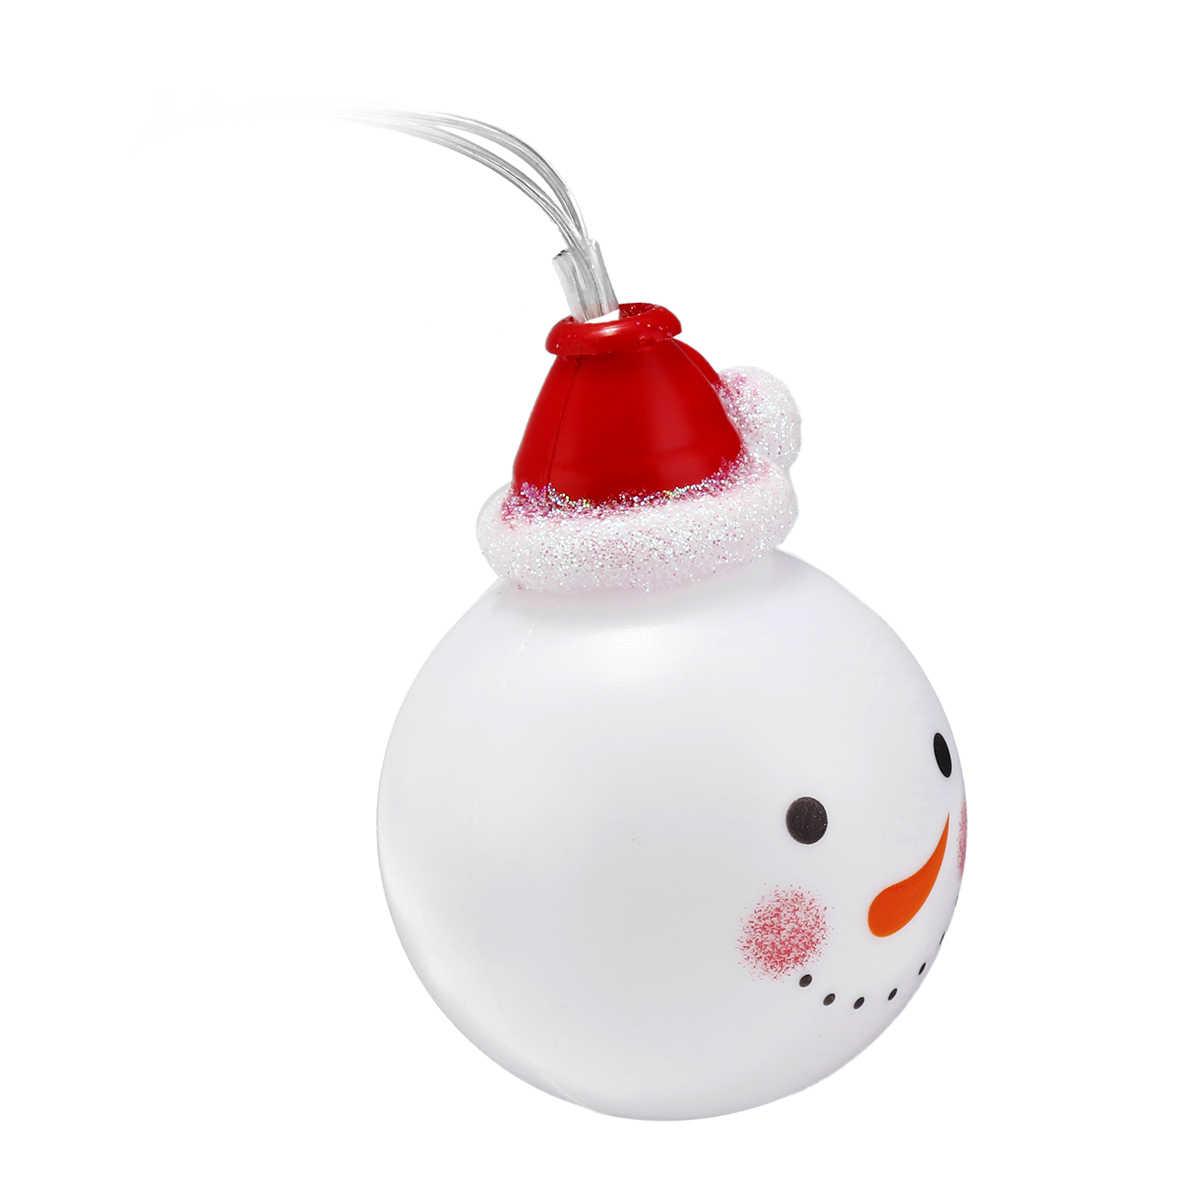 3/1.5m 10/20 LEDS Christmas Snow Man Shape LED String Lights Battery Operated Holiday Lighting Christmas Tree Decor